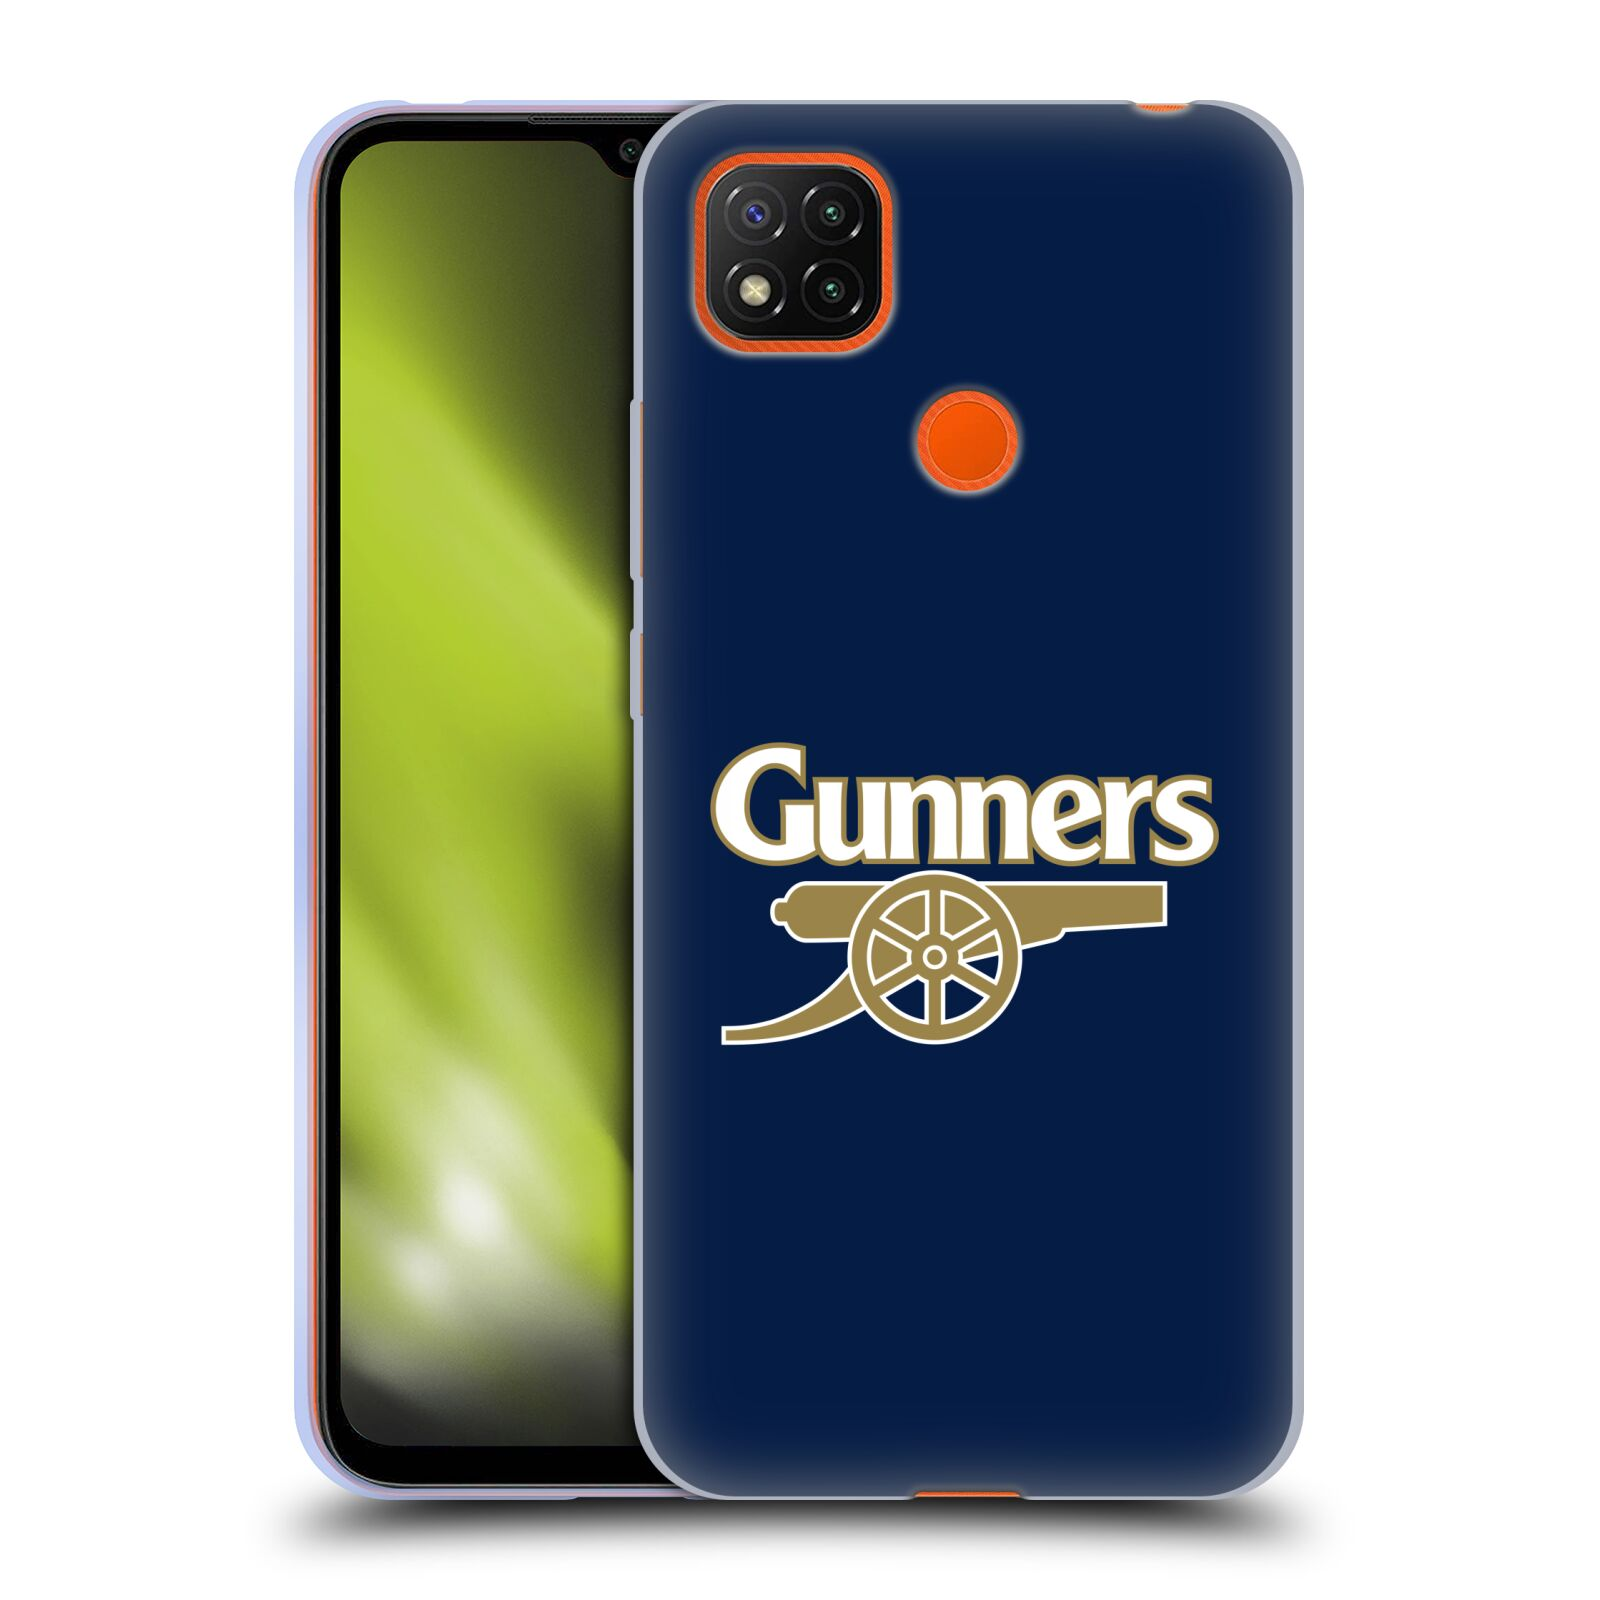 Silikonové pouzdro na mobil Xiaomi Redmi 9C - Head Case - Arsenal FC - Gunners